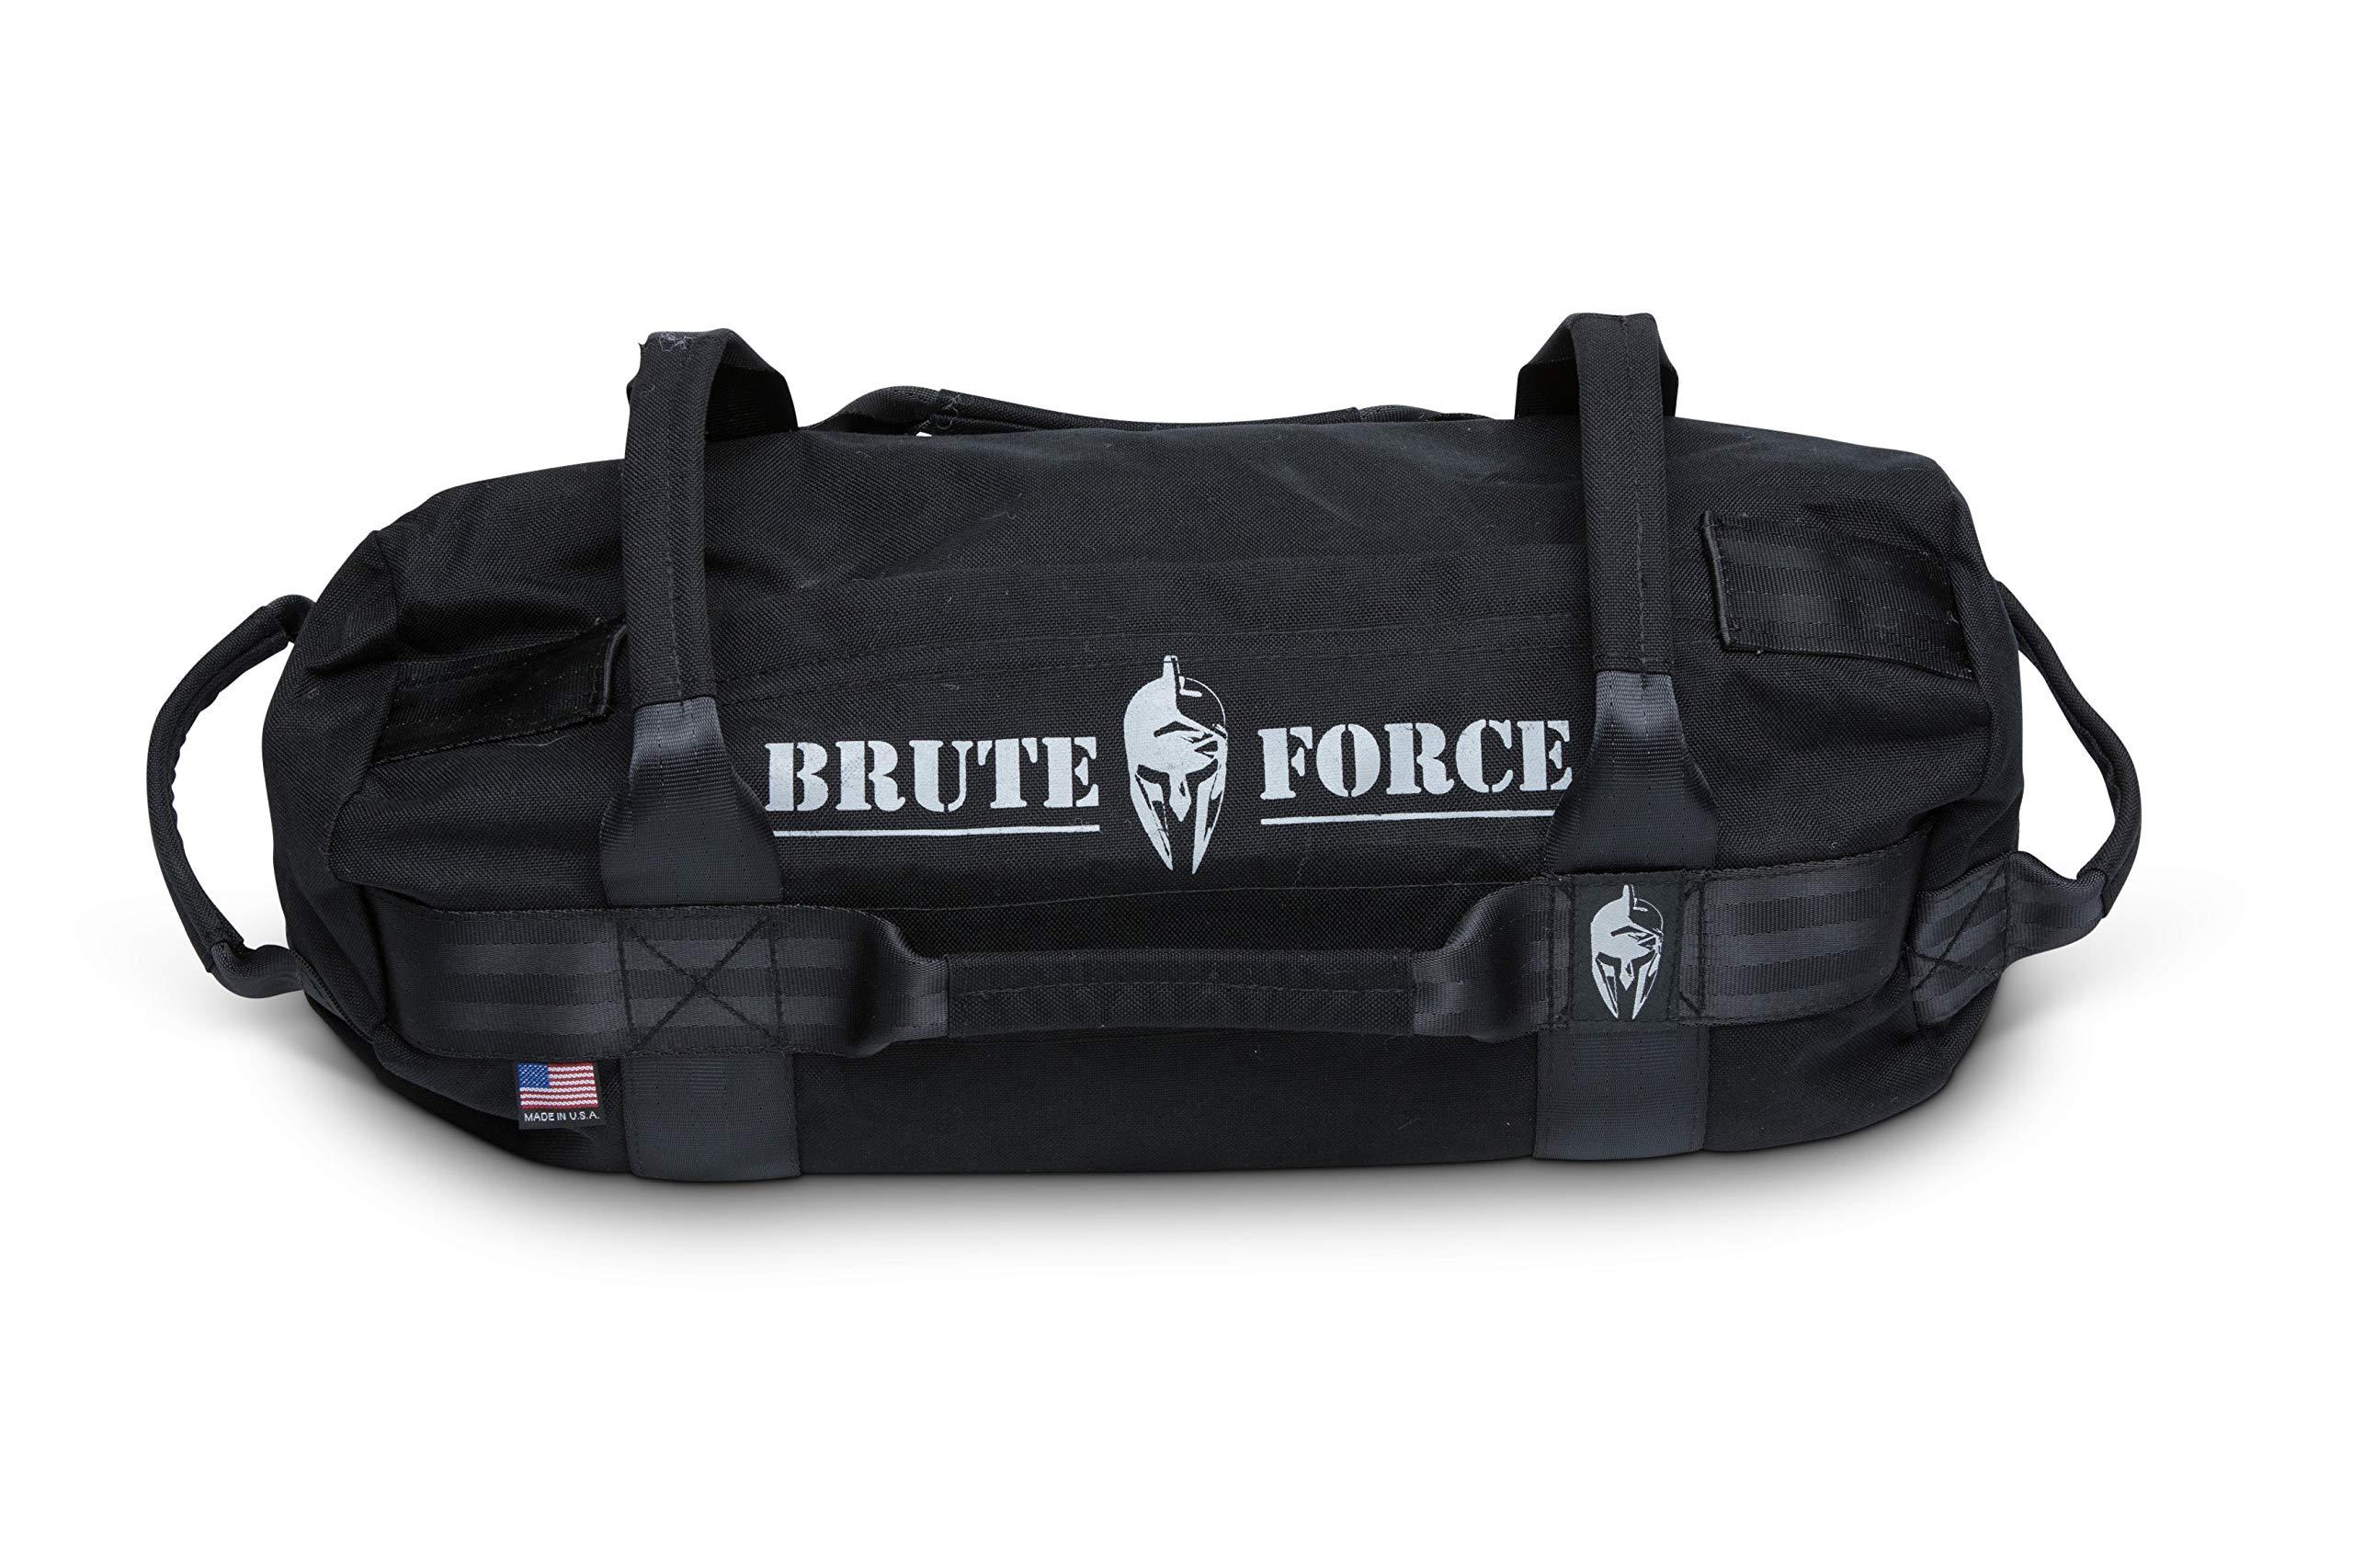 Brute Force Sandbags - Mini Sandbag - Black - Heavy Duty Sandbag Crossfit Workout Equipment Weighted Bags Heavy Sand Bags Military sandbags